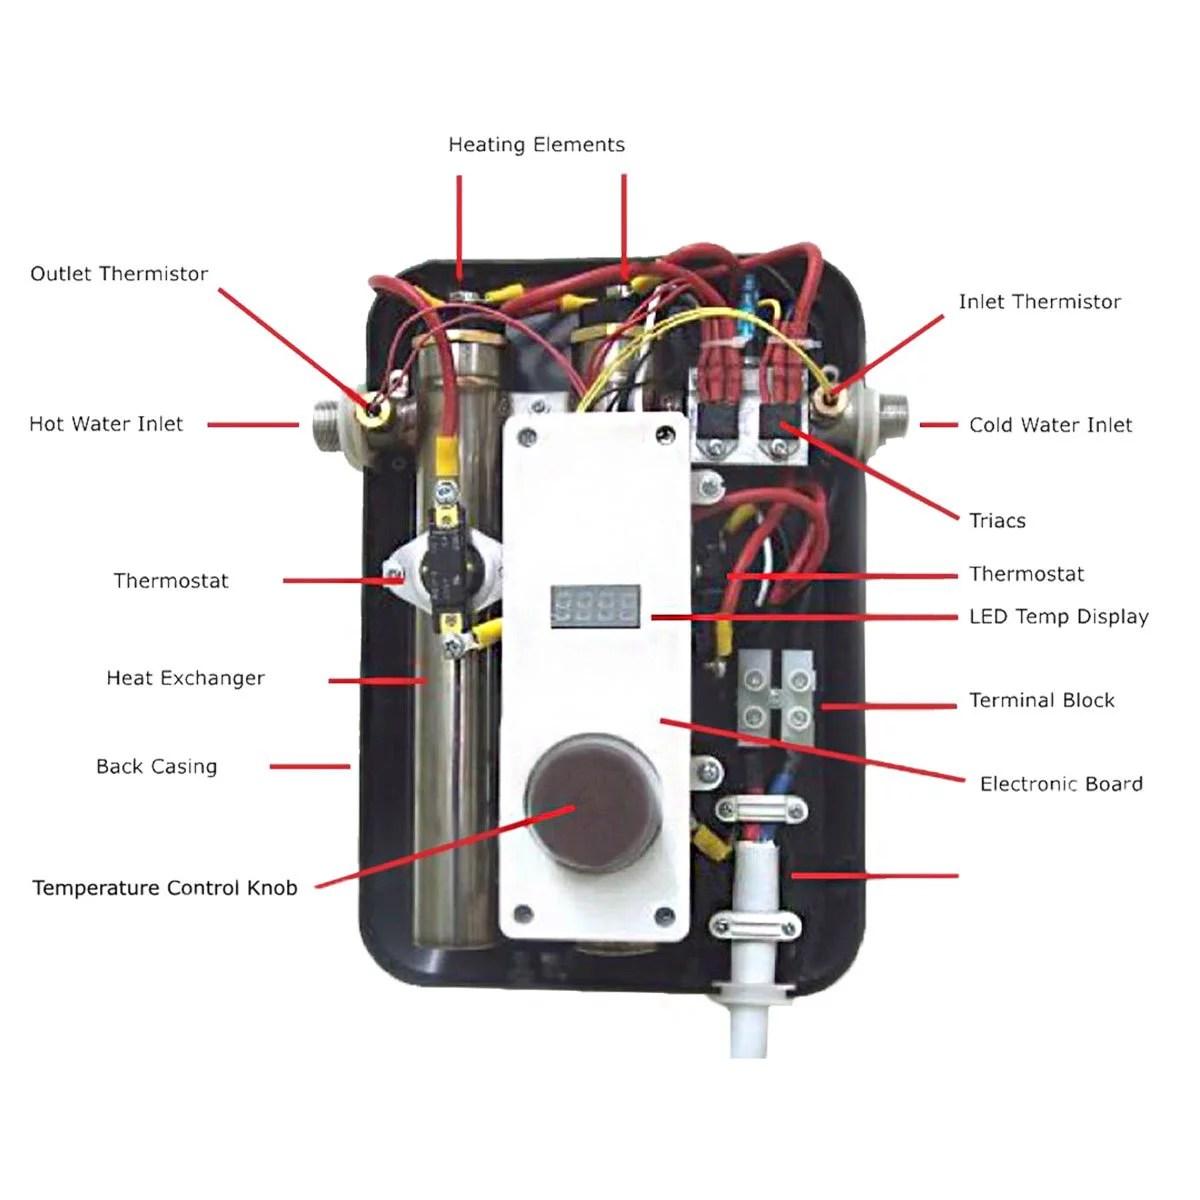 medium resolution of eemax ha018240 homeadvantage ii residential tankless electric hot mix eemax ha018240 homeadvantage ii residential tankless electric eemax wiring diagrams